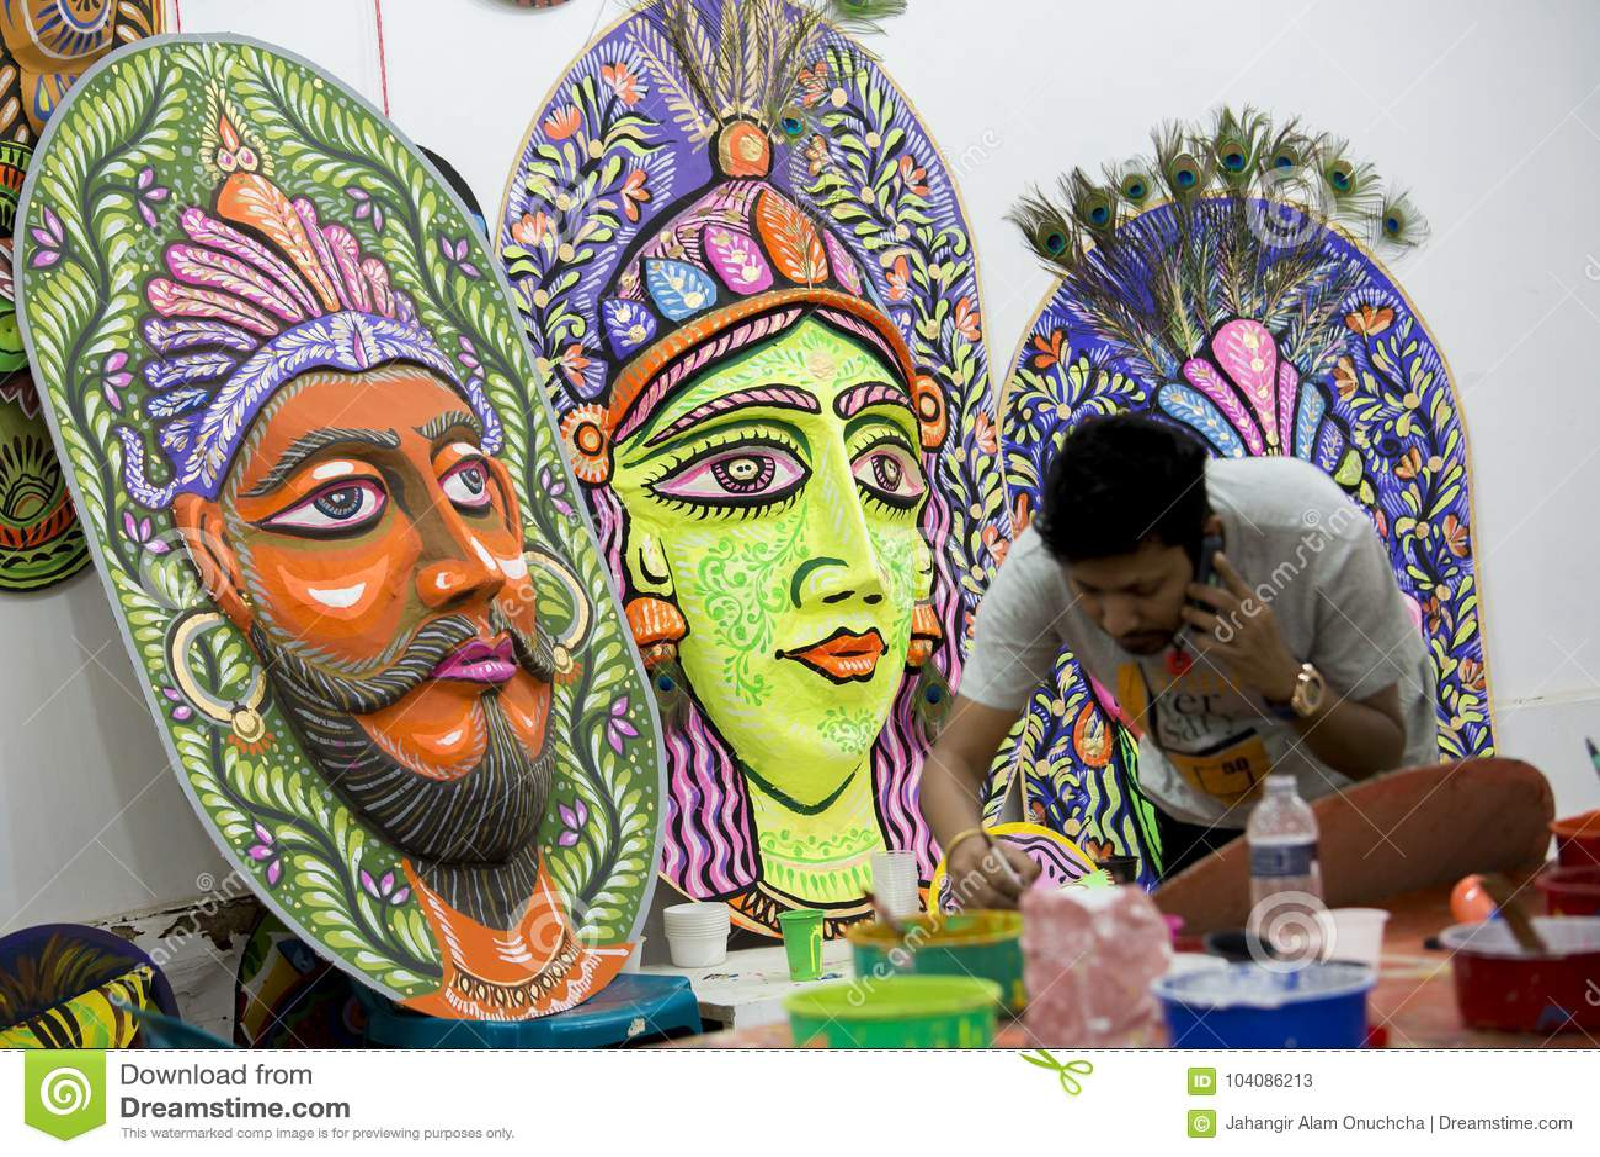 Art institute student preparing a big size colorful mask.